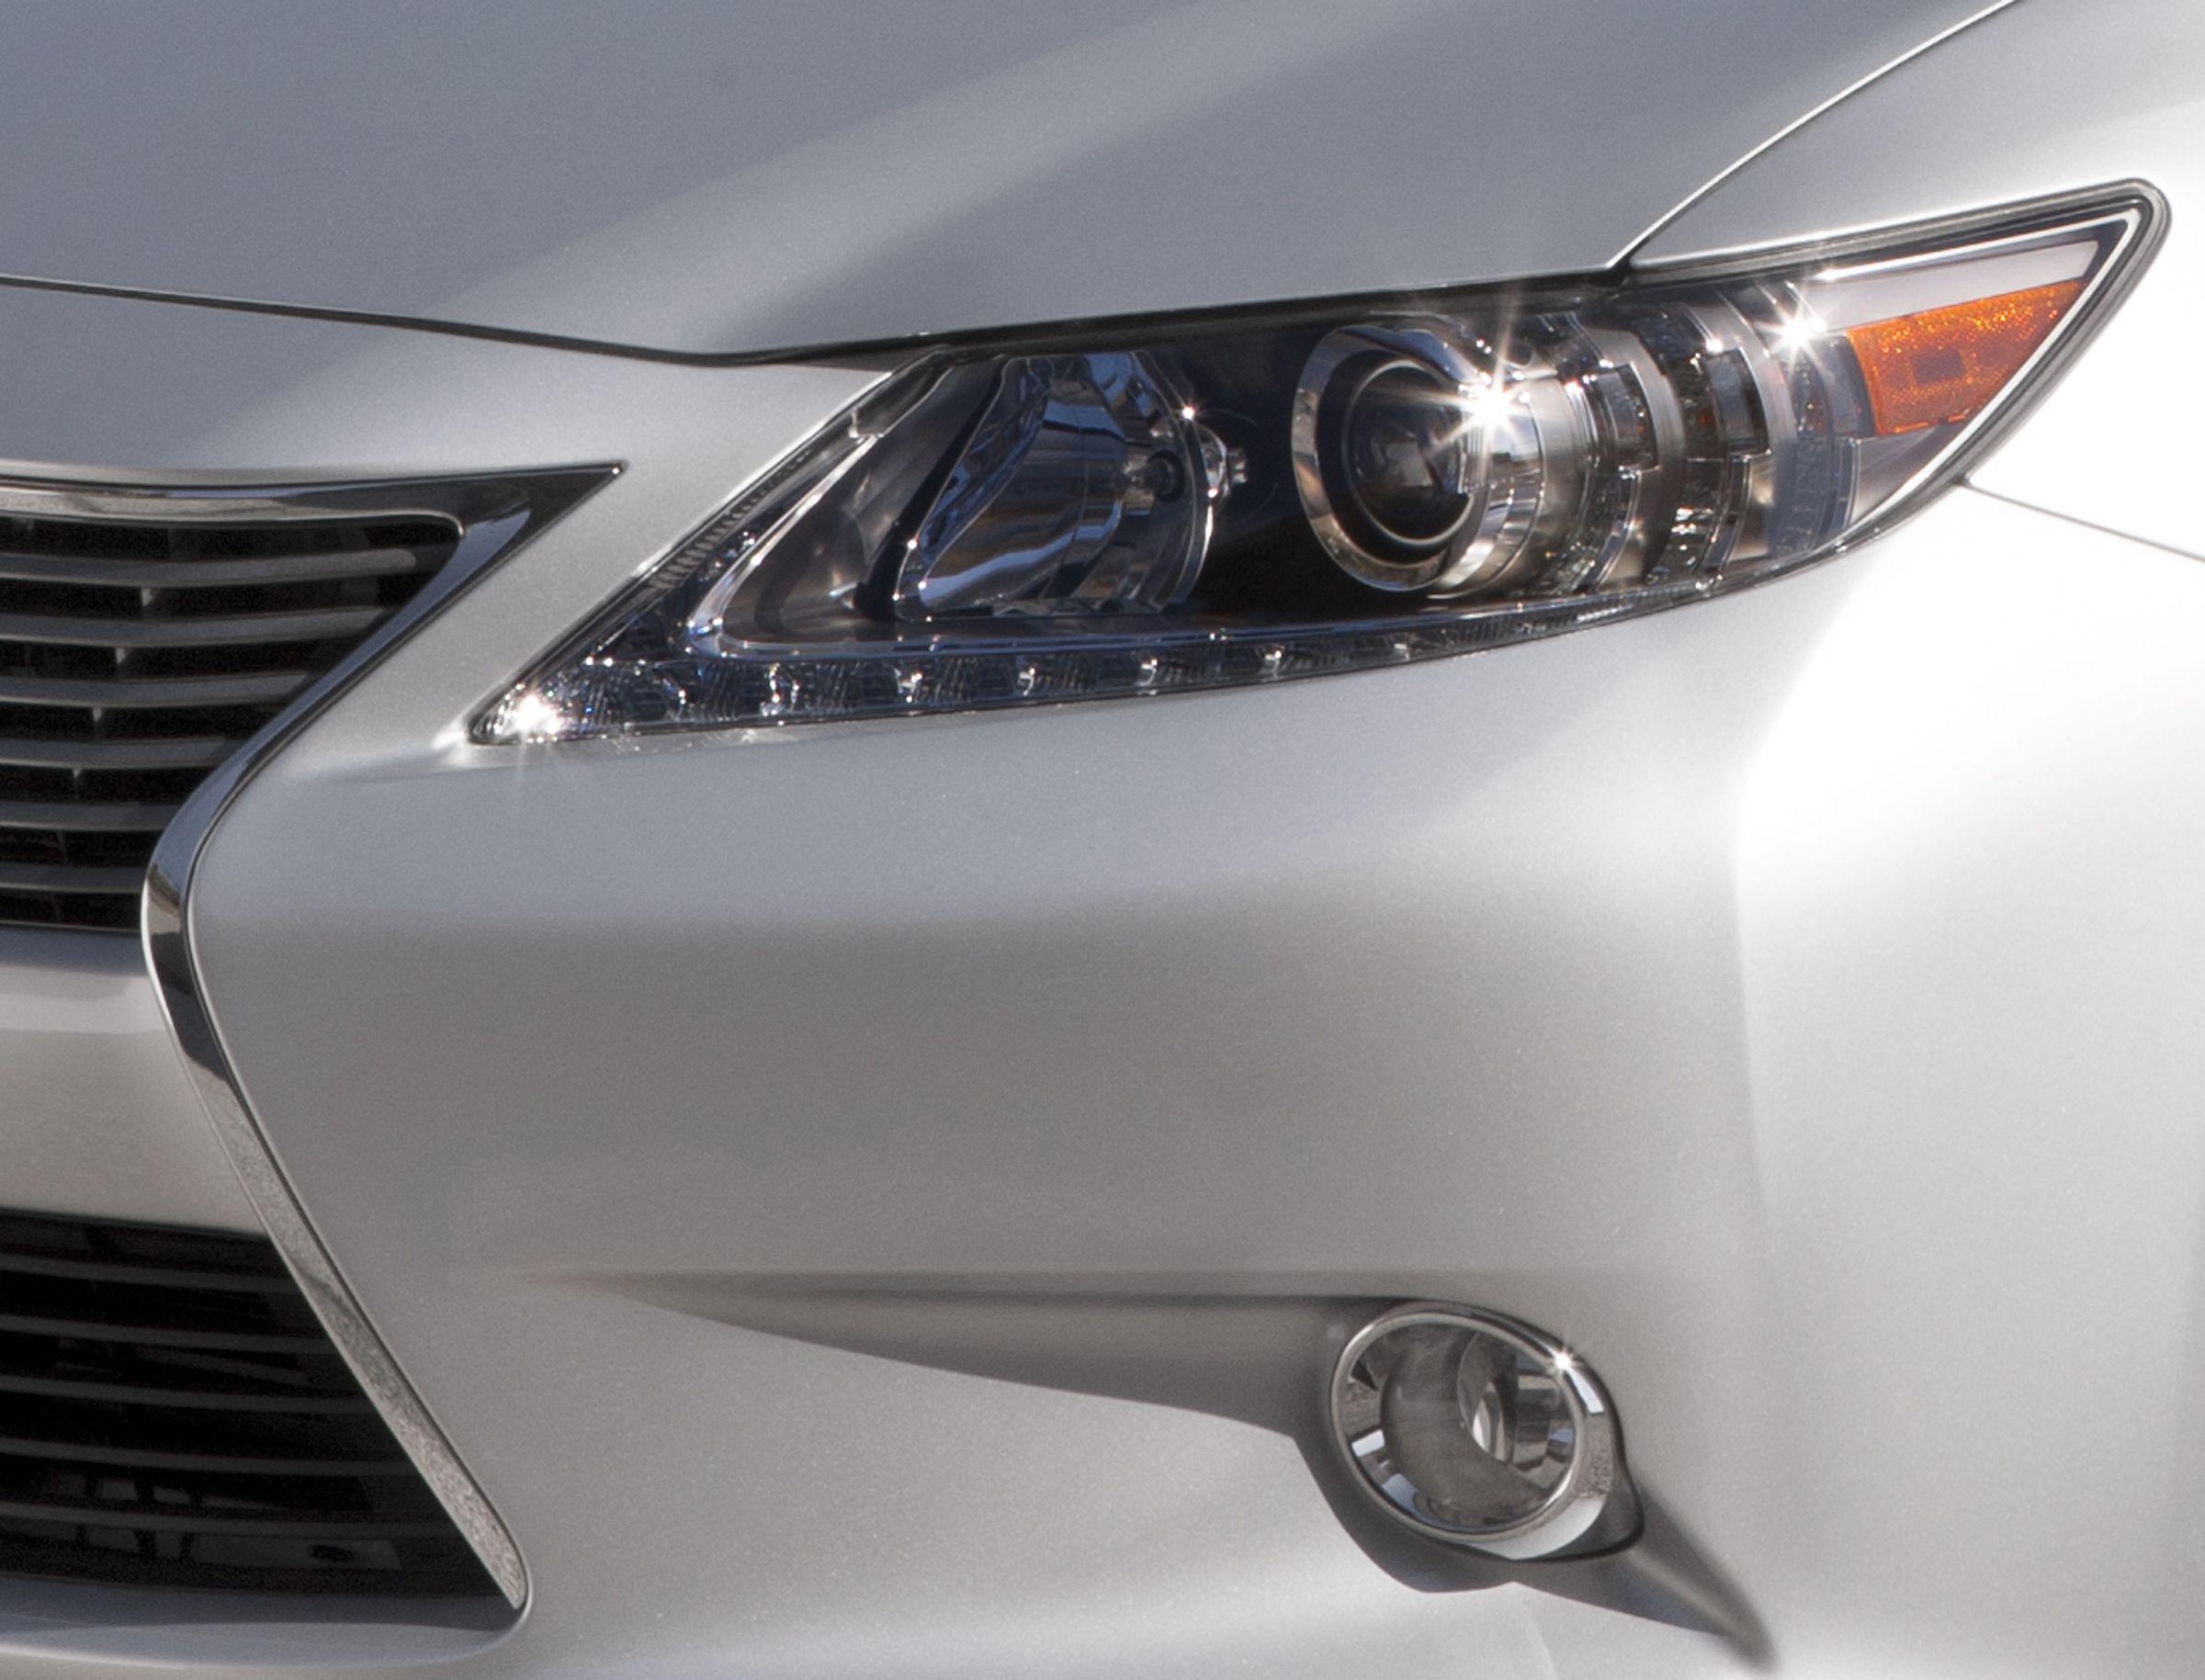 Toyota to Show All-New Lexus ES Sedan in New York